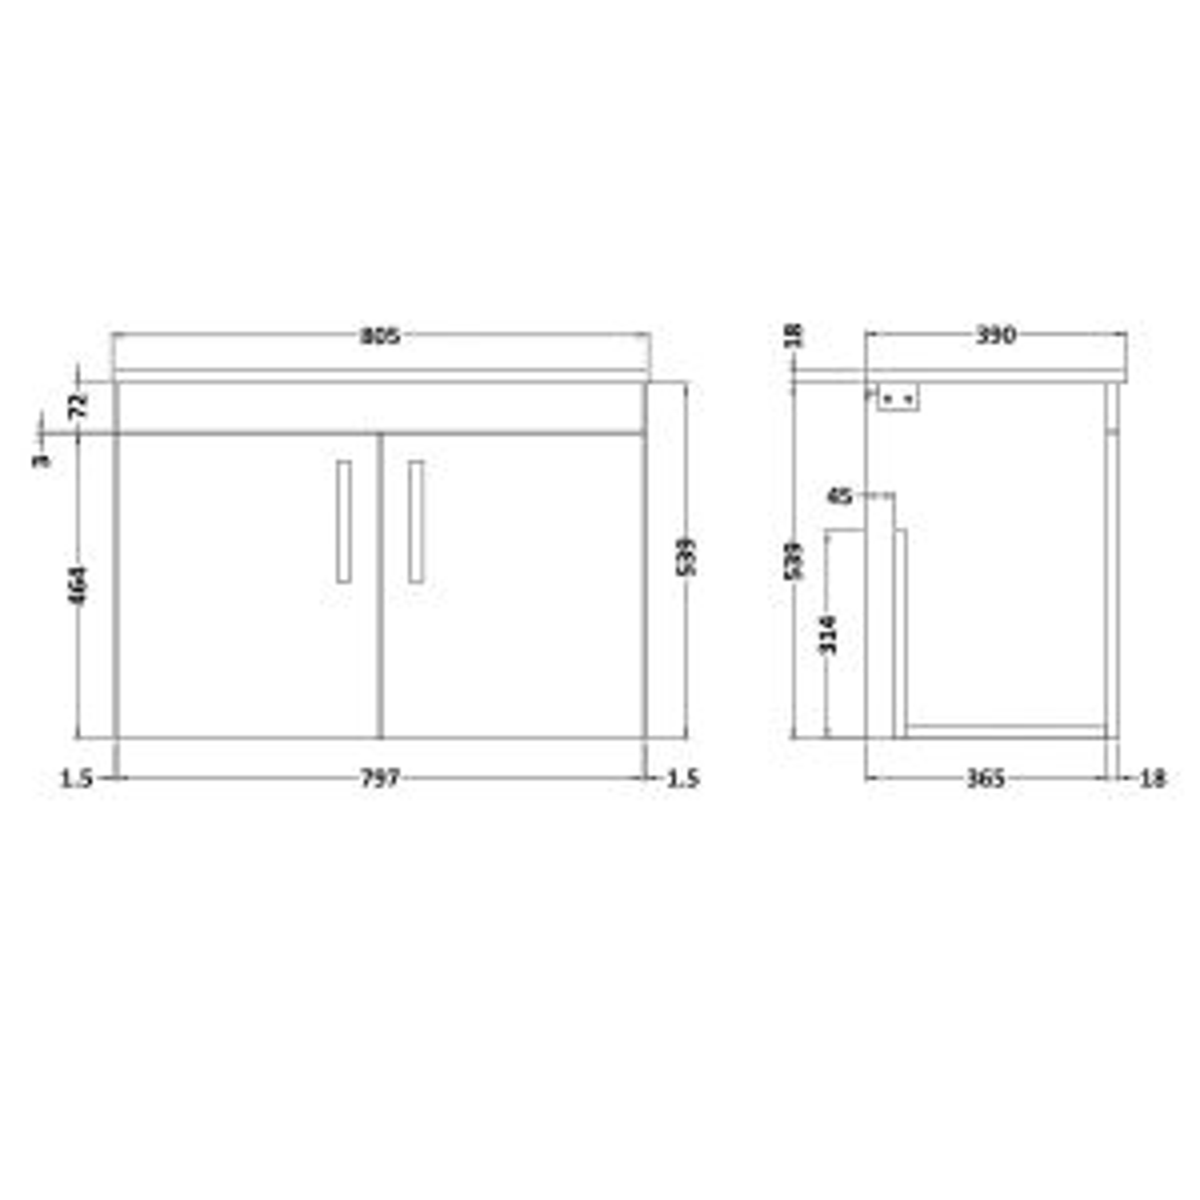 Nuie Athena Grey Avola 2 Door Wall Hung Vanity Unit with 18mm Worktop 800mm Line Drawing